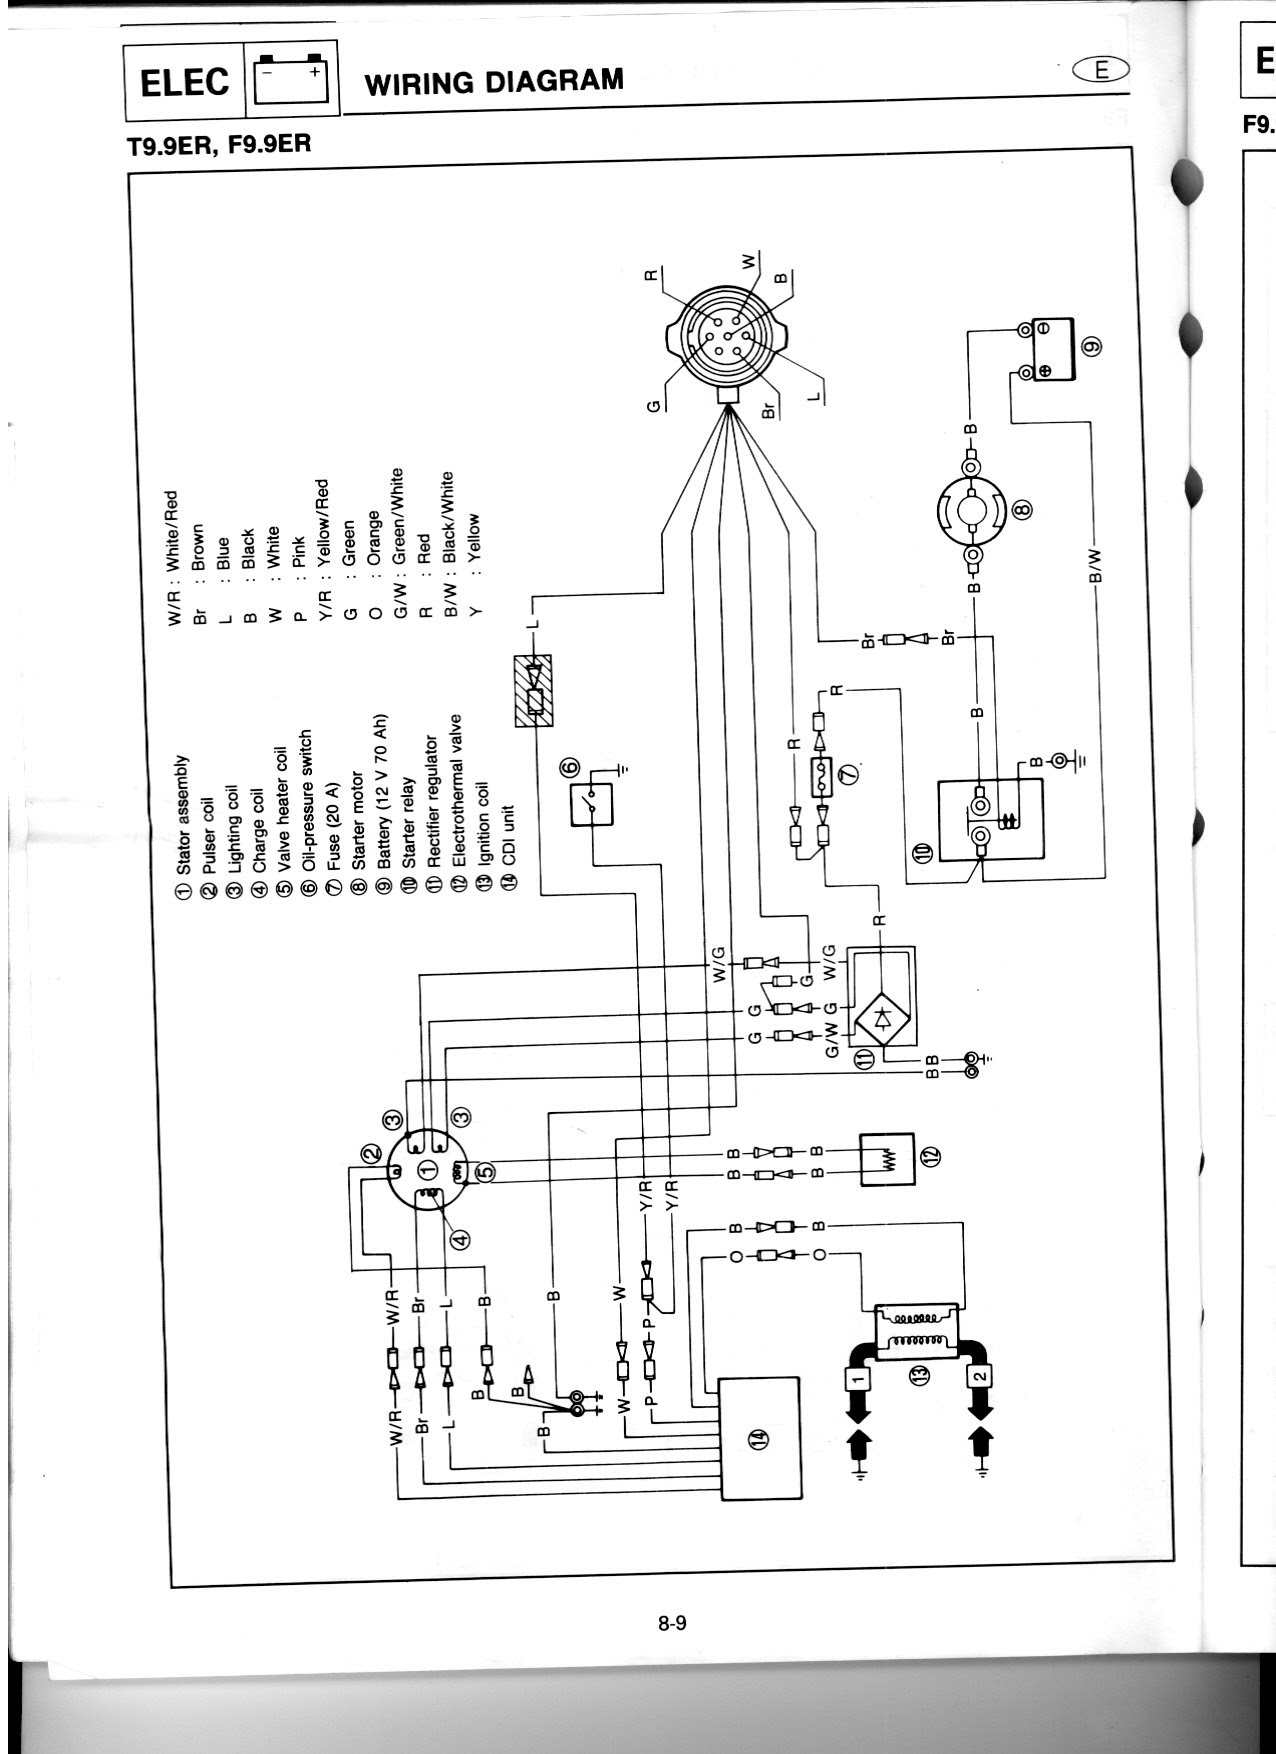 Yamaha G22 Golf Cart Wiring Diagram Manual Guide